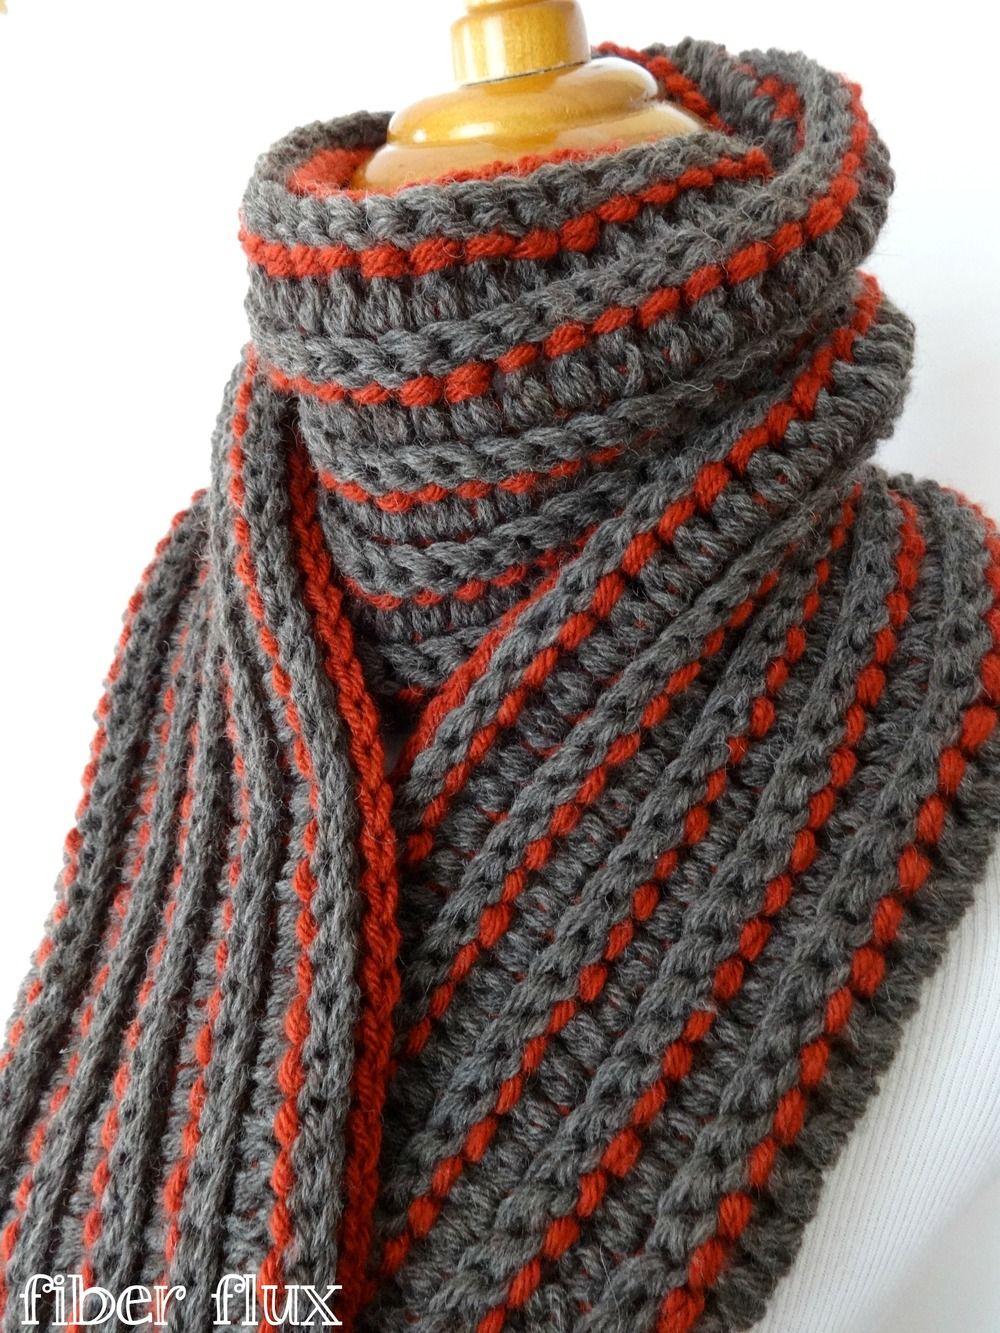 Every Man Crochet Scarf | Ganchillo, Tejido y Cuellos tejidos